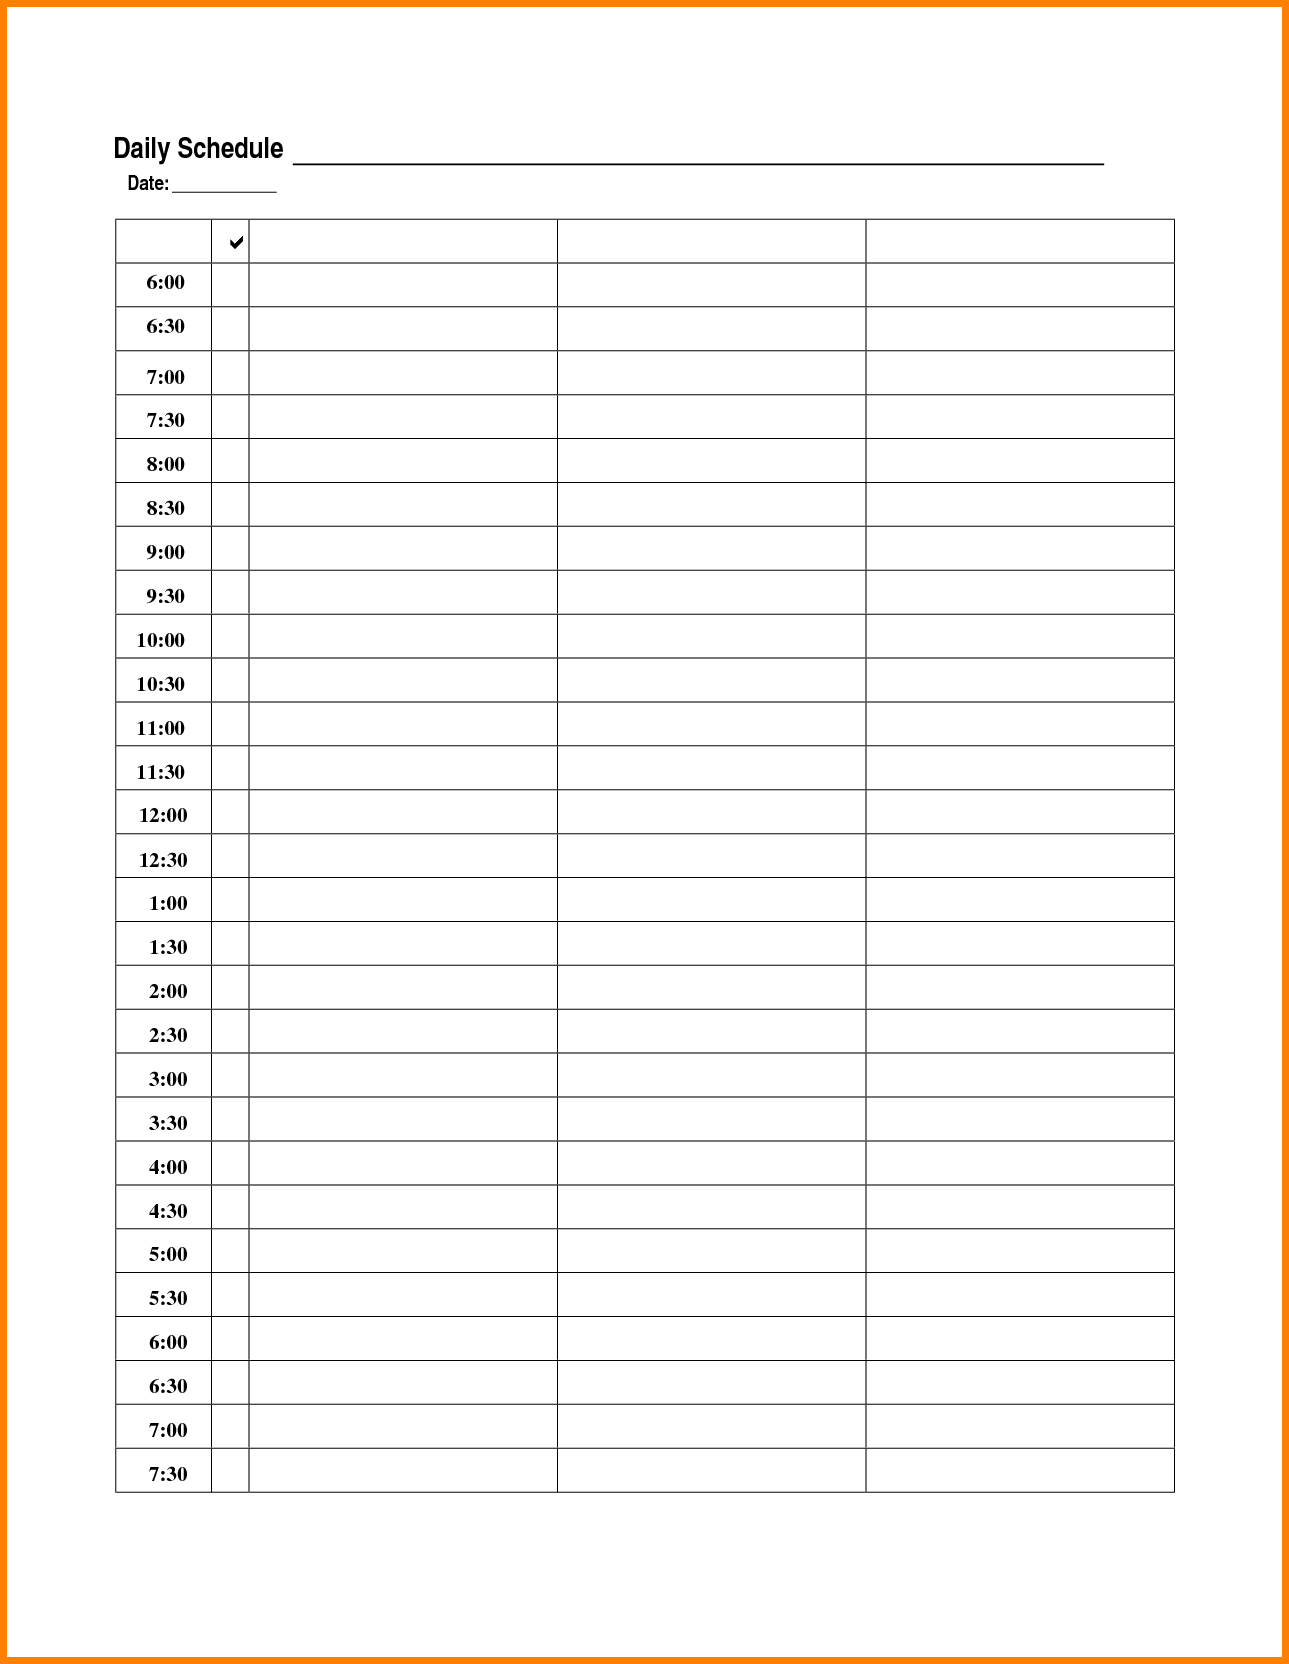 schedule spreadsheet template schedule spreadsheet spreadsheet templates for busines monthly. Black Bedroom Furniture Sets. Home Design Ideas